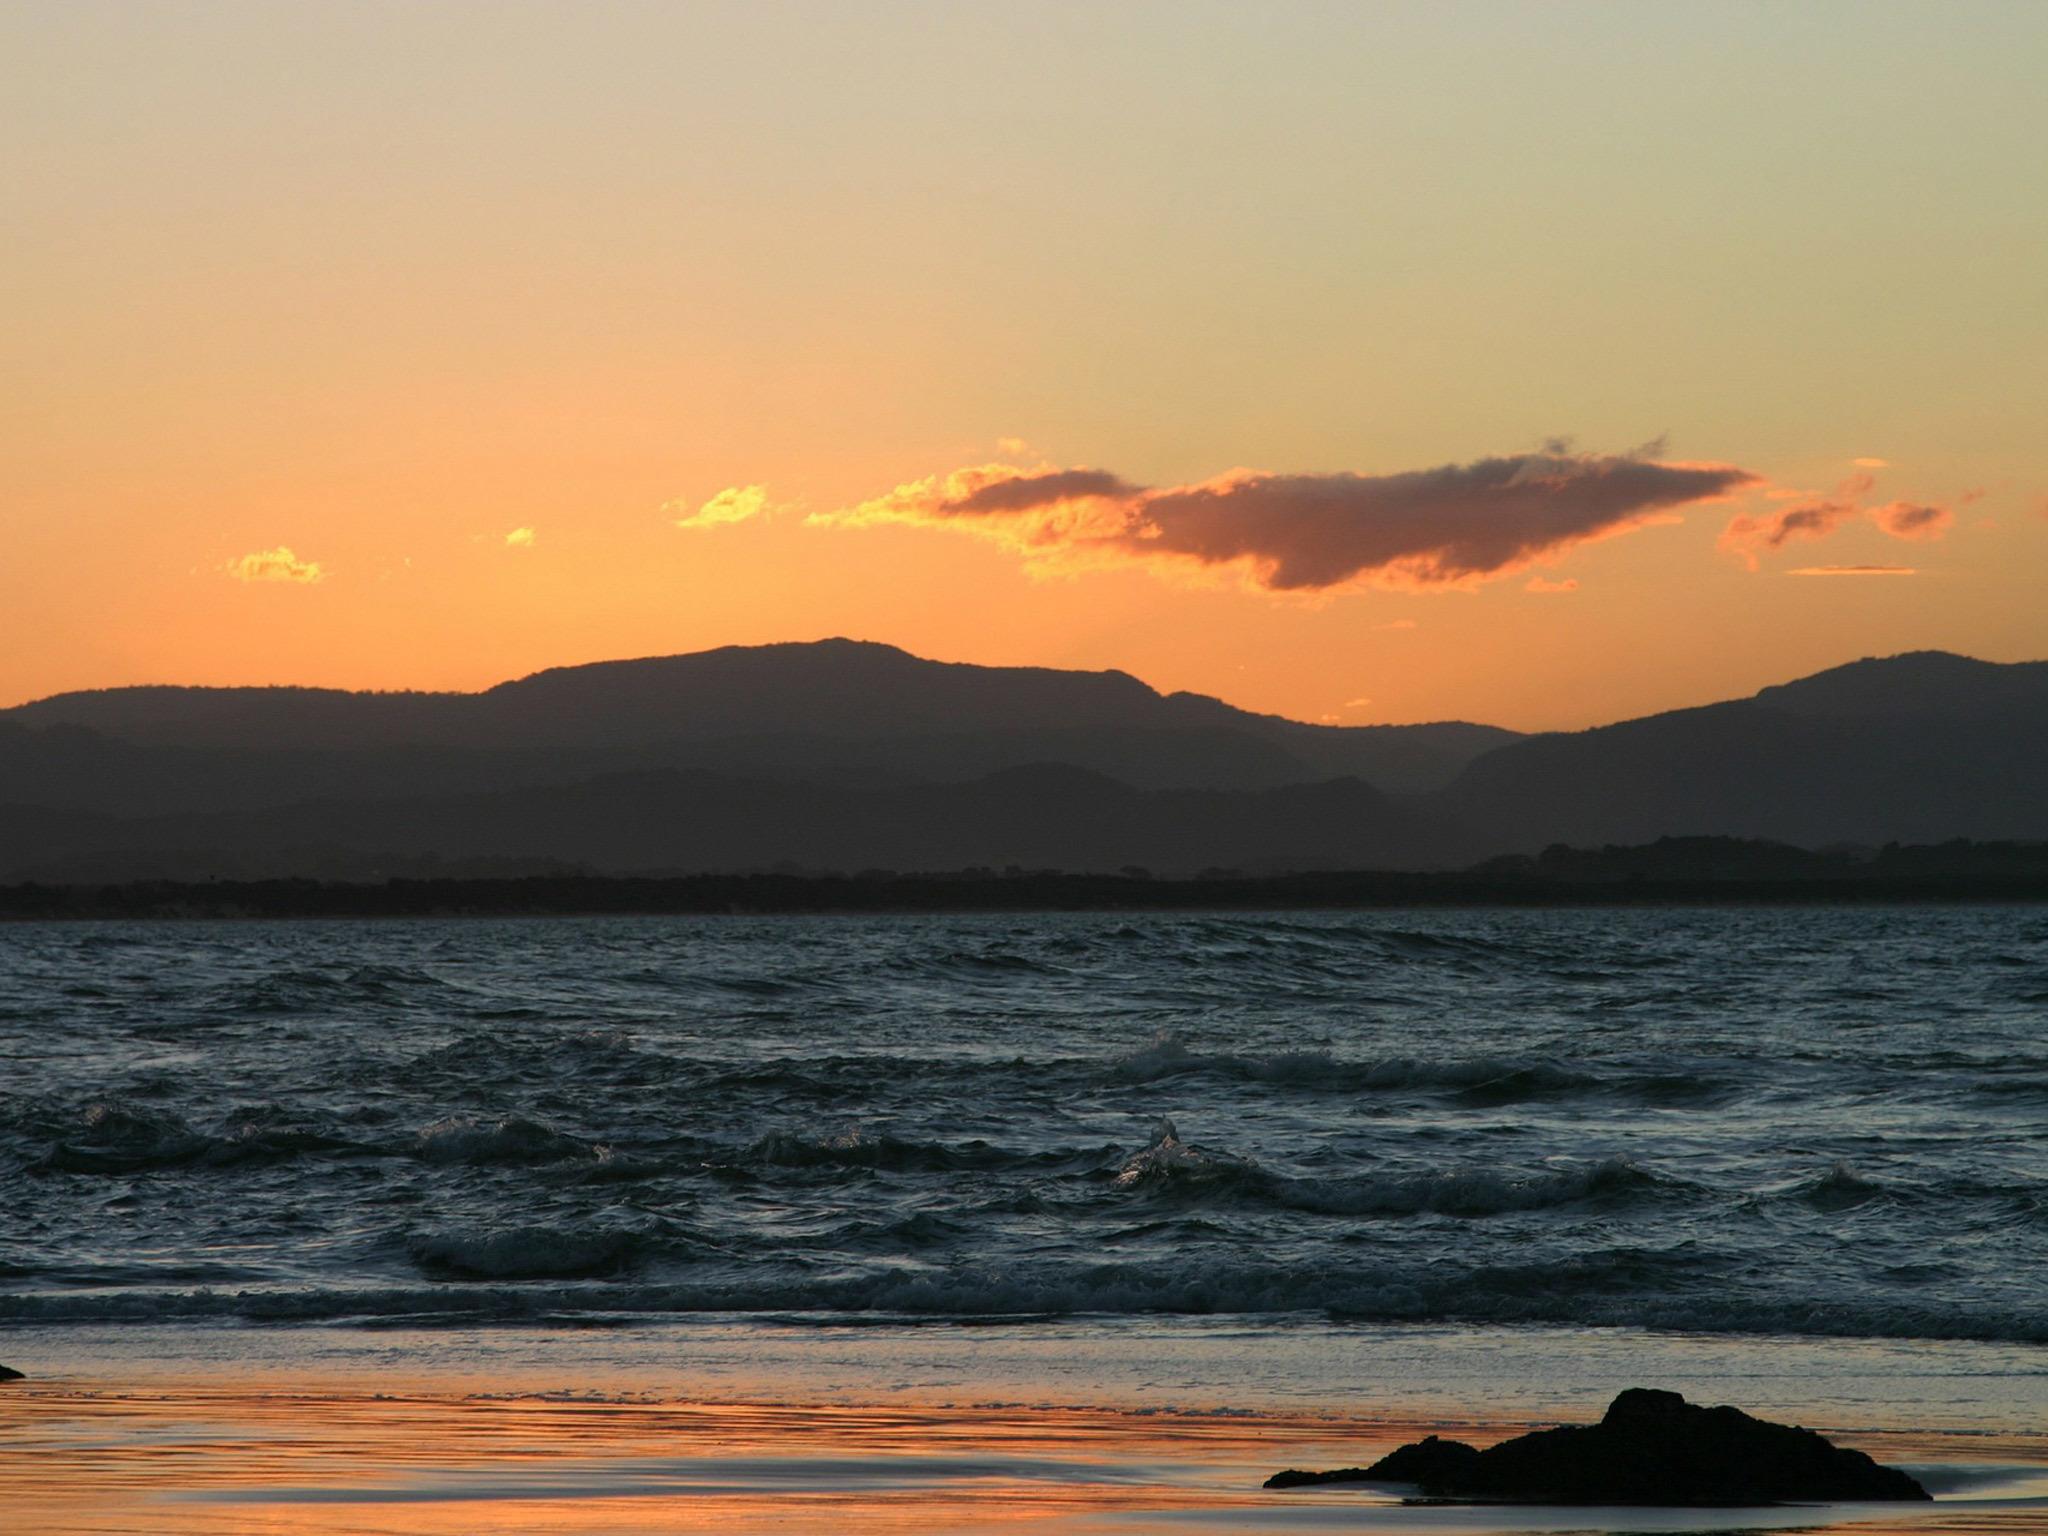 Sunset over Almanarre beach in Hyères